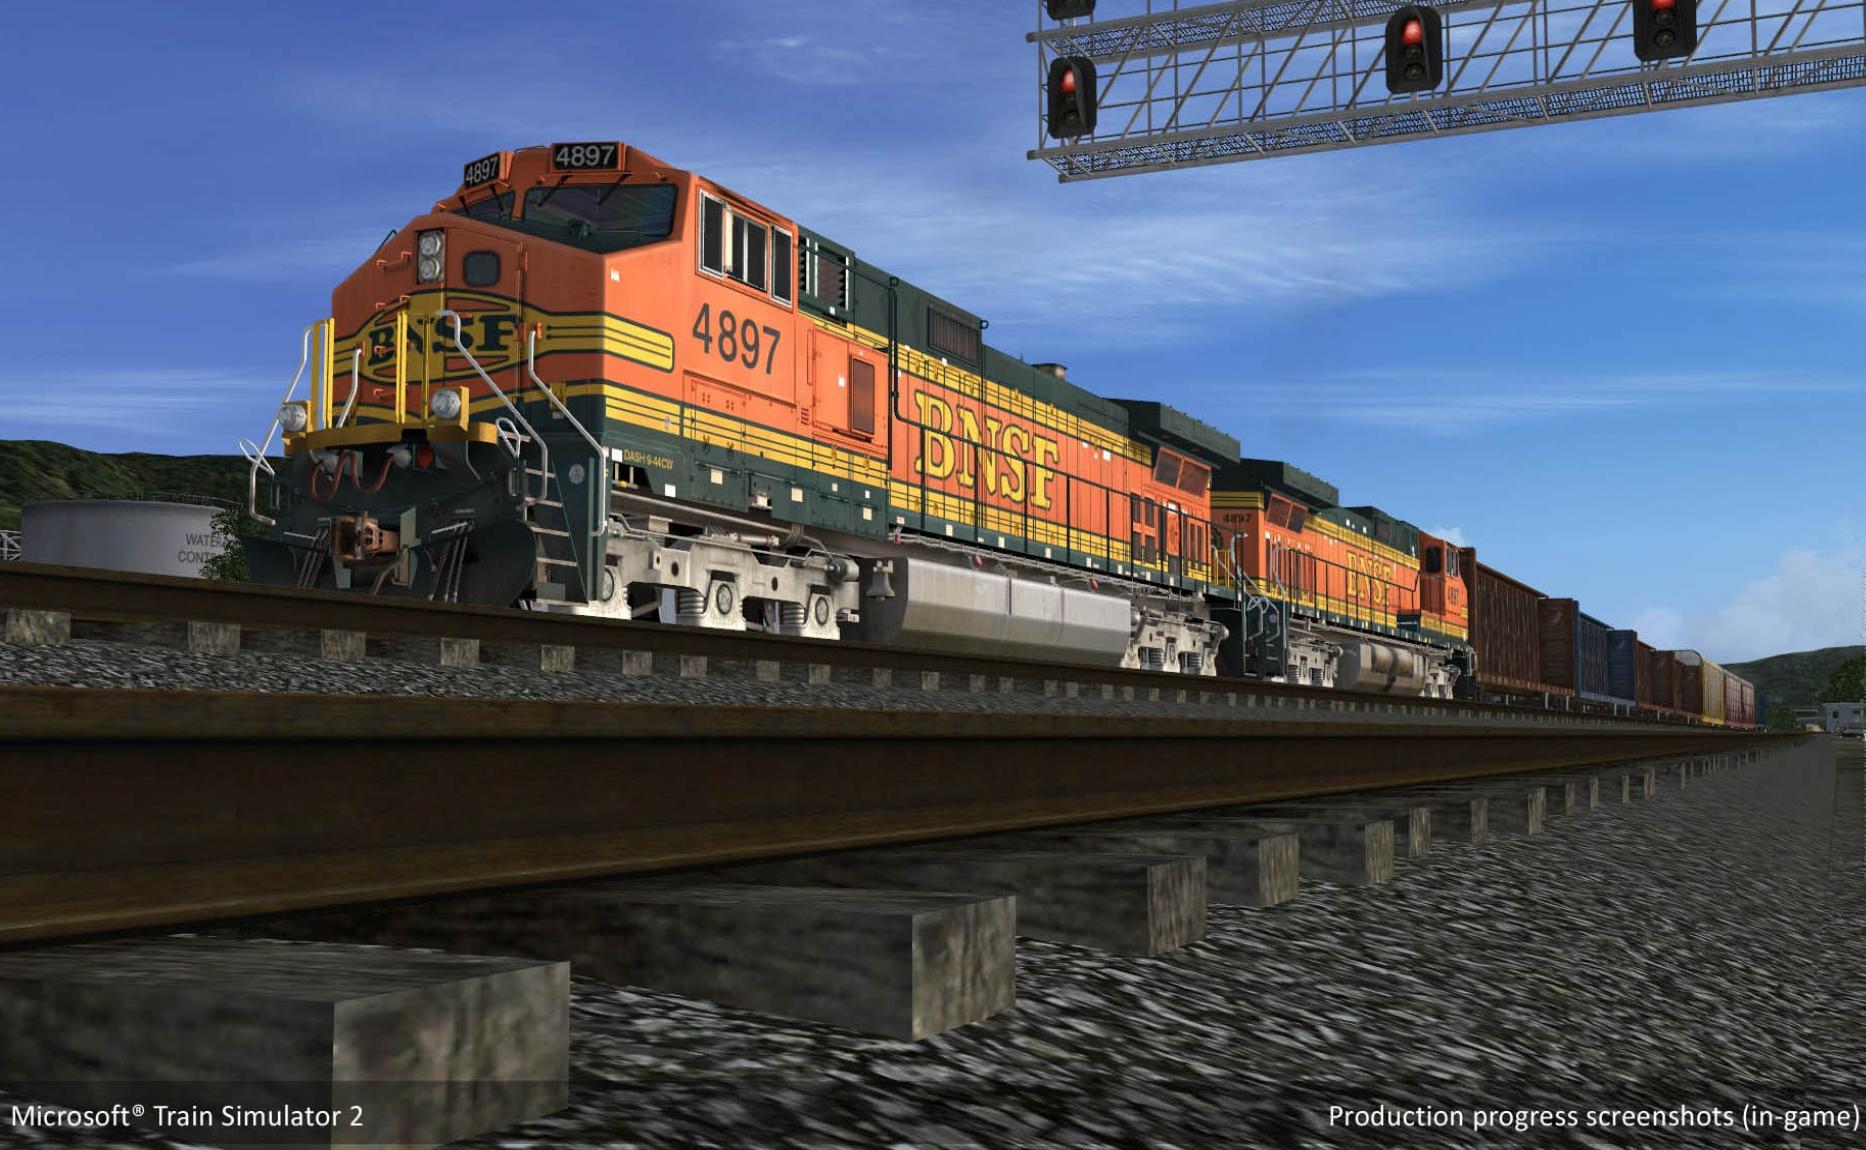 Скриншоты для игры Microsoft Train Simulator 2 (2009)